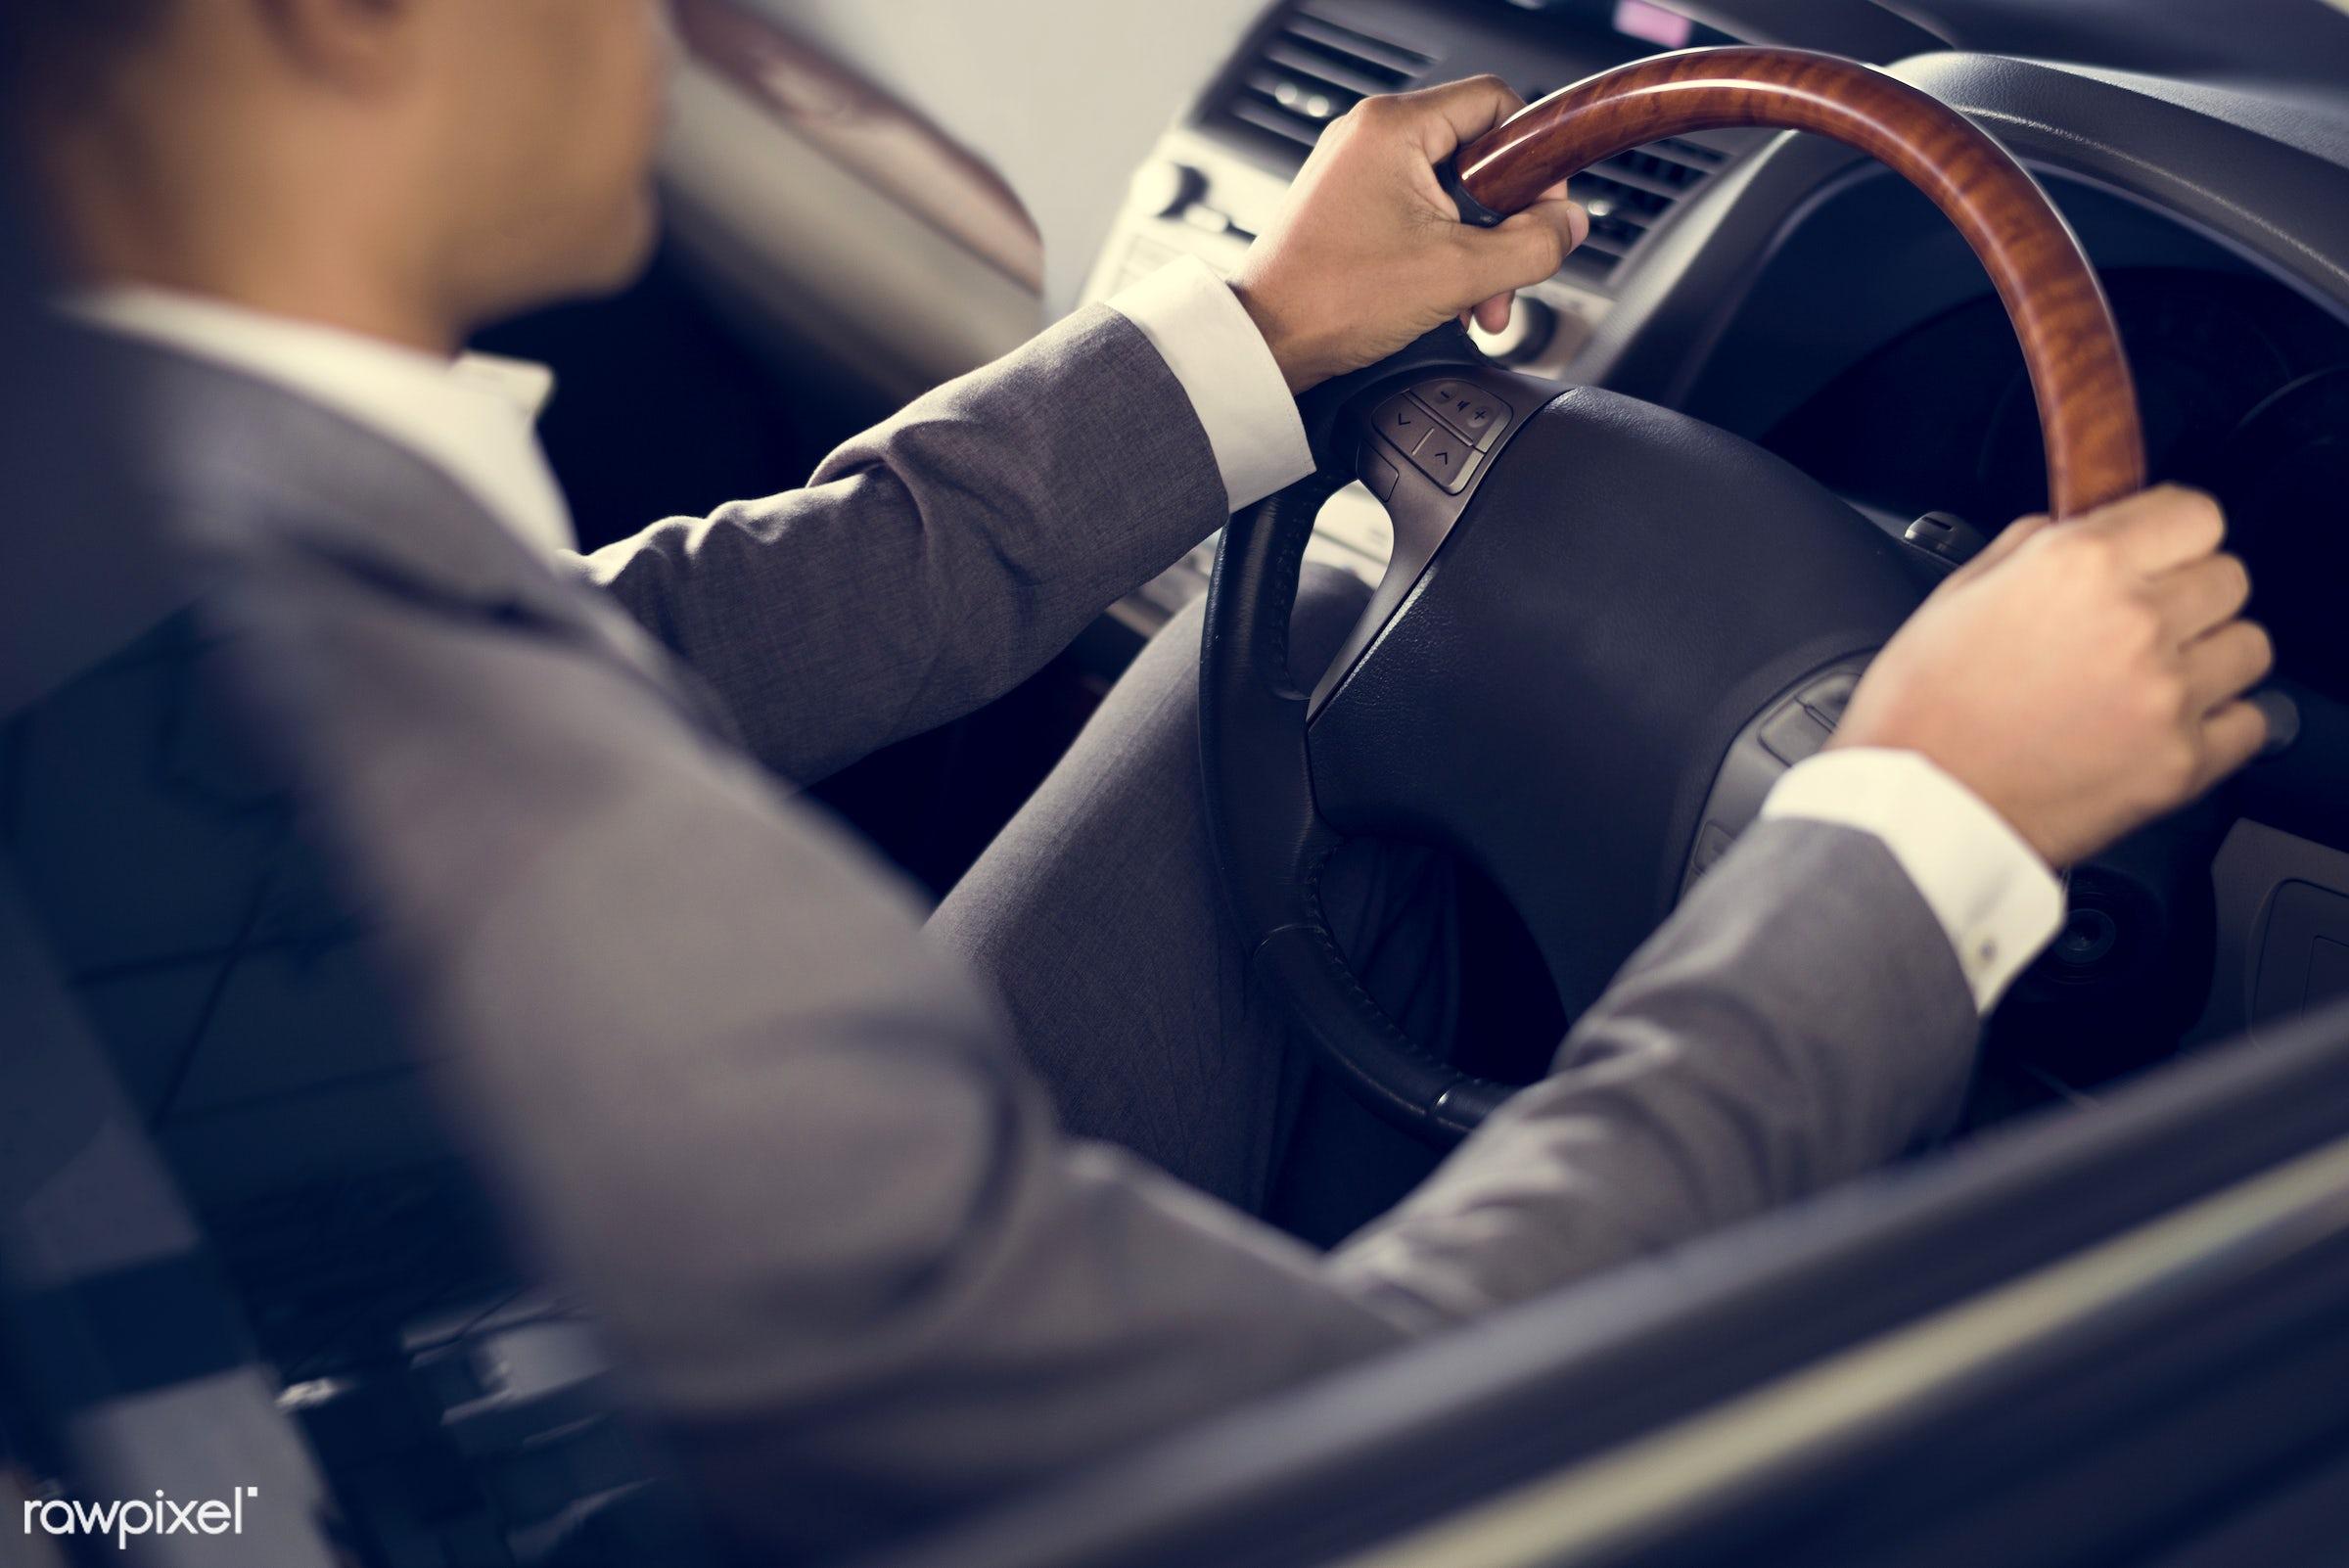 car, person, suit and tie, wheel, automobile, vehicle, transportation, road test, people, caucasian, comfortable,...